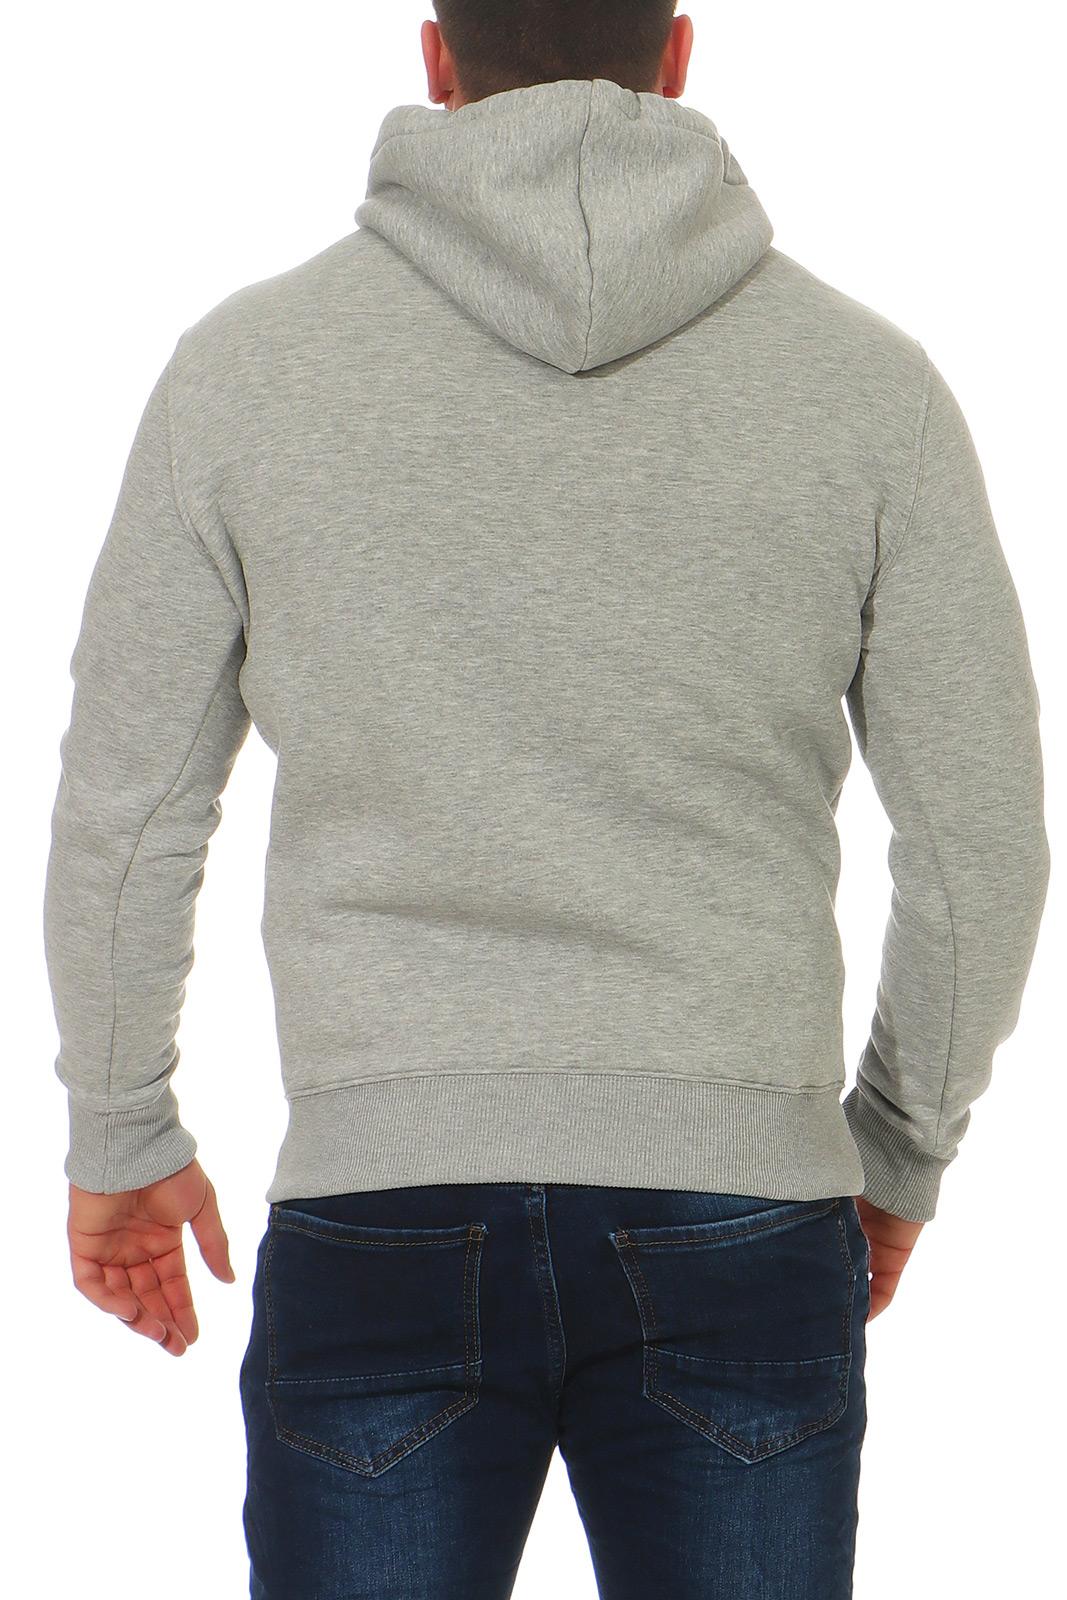 Alpha-Industries-Uomo-Hoody-Pullover-Basic-sweater-NUOVO-178312-hoodie-s-3xl miniatura 6